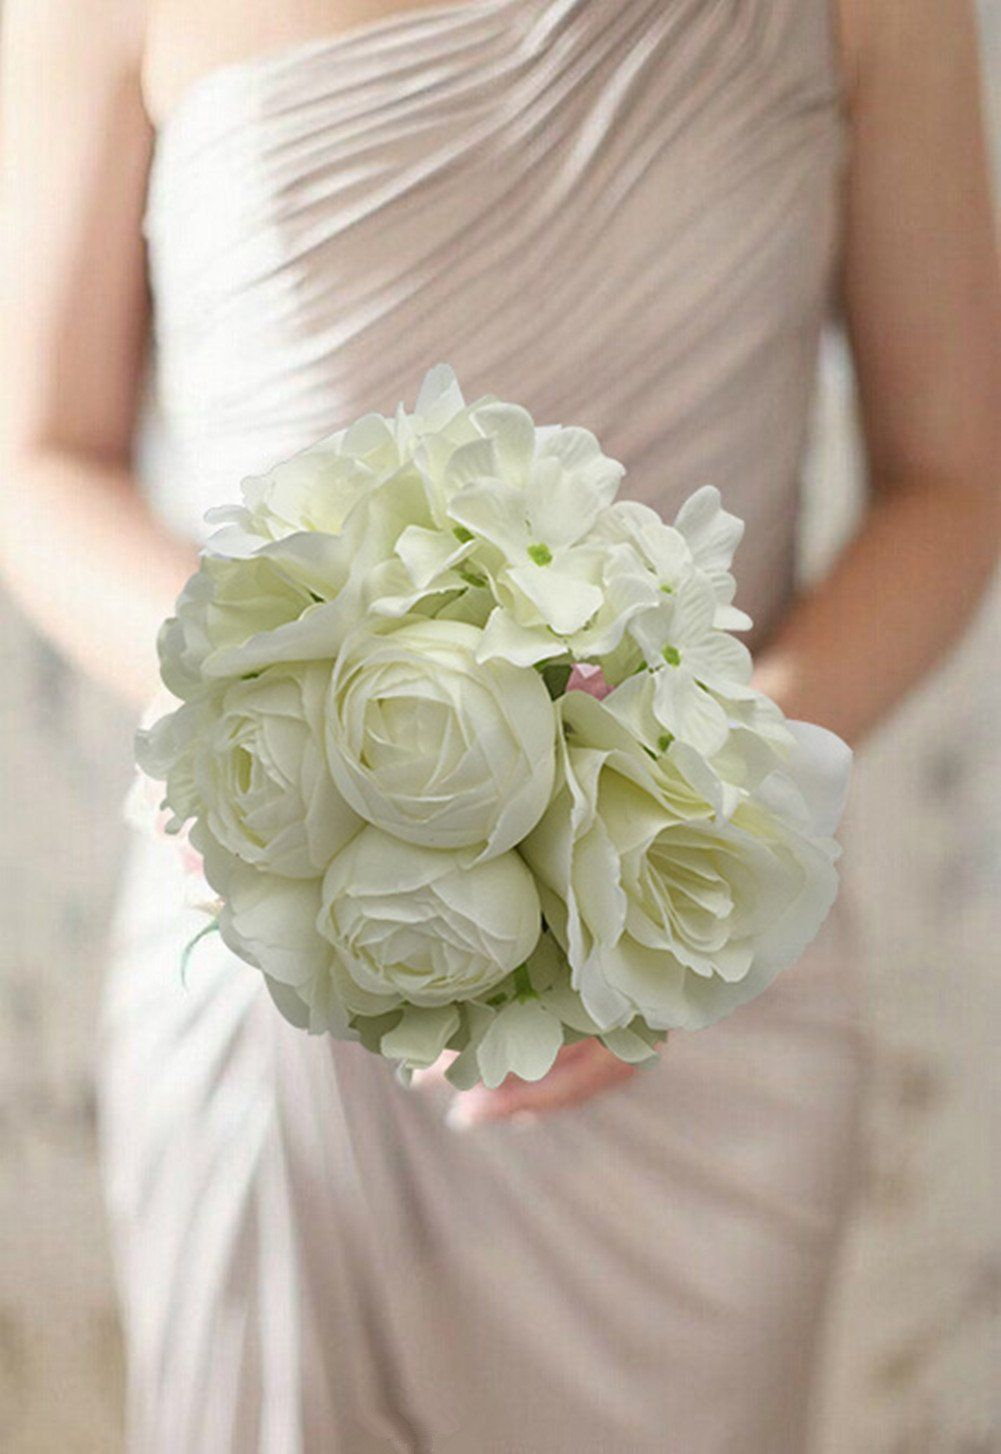 amazon: yamuda bridal wedding bouquet flower arrangement